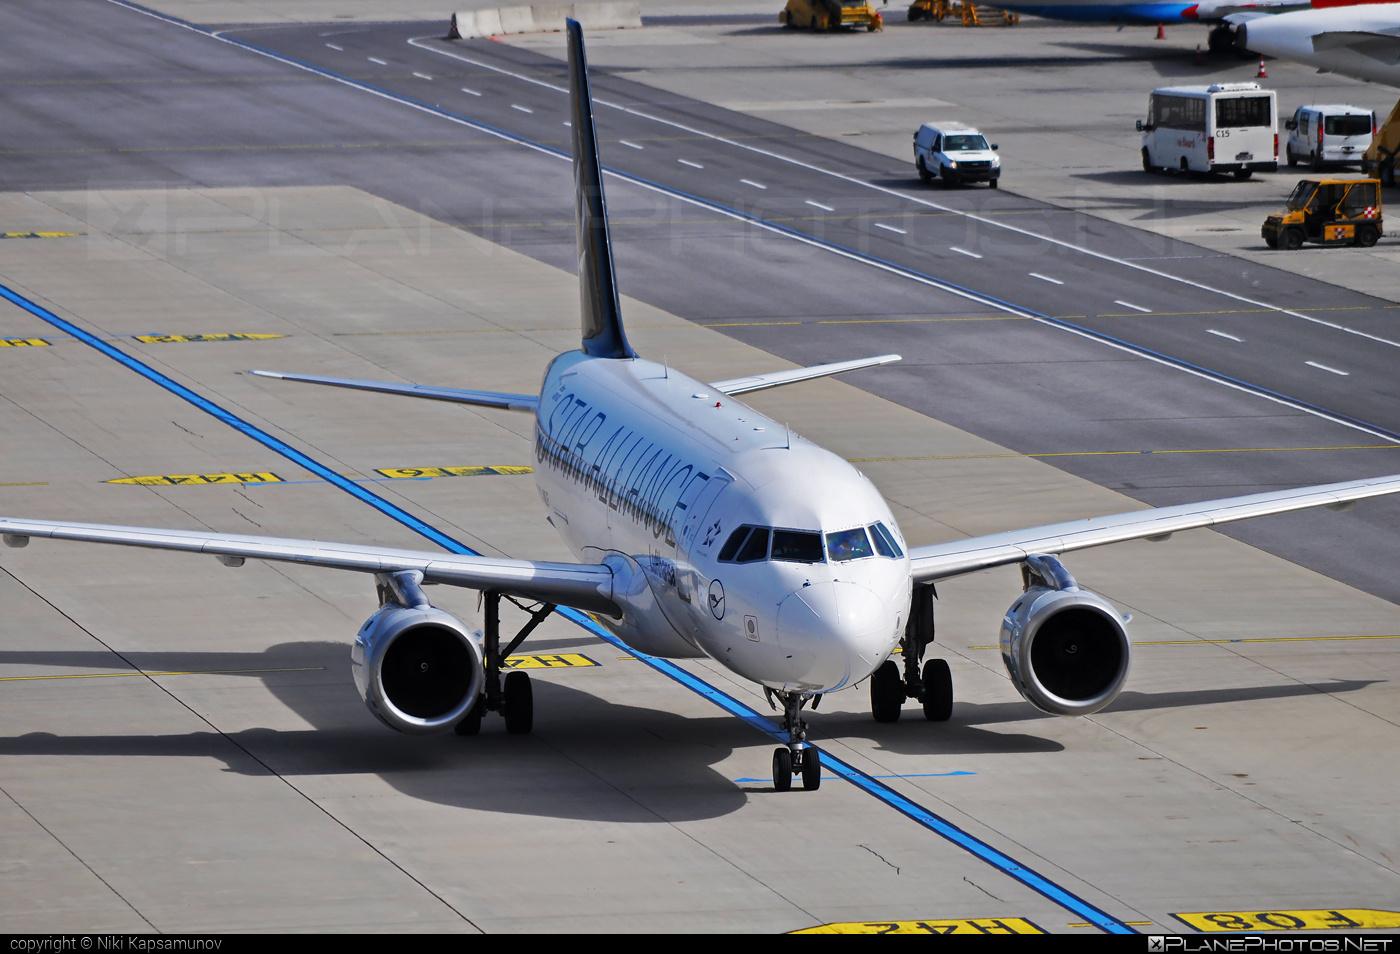 Airbus A319-114 - D-AILF operated by Lufthansa #a319 #a320family #airbus #airbus319 #lufthansa